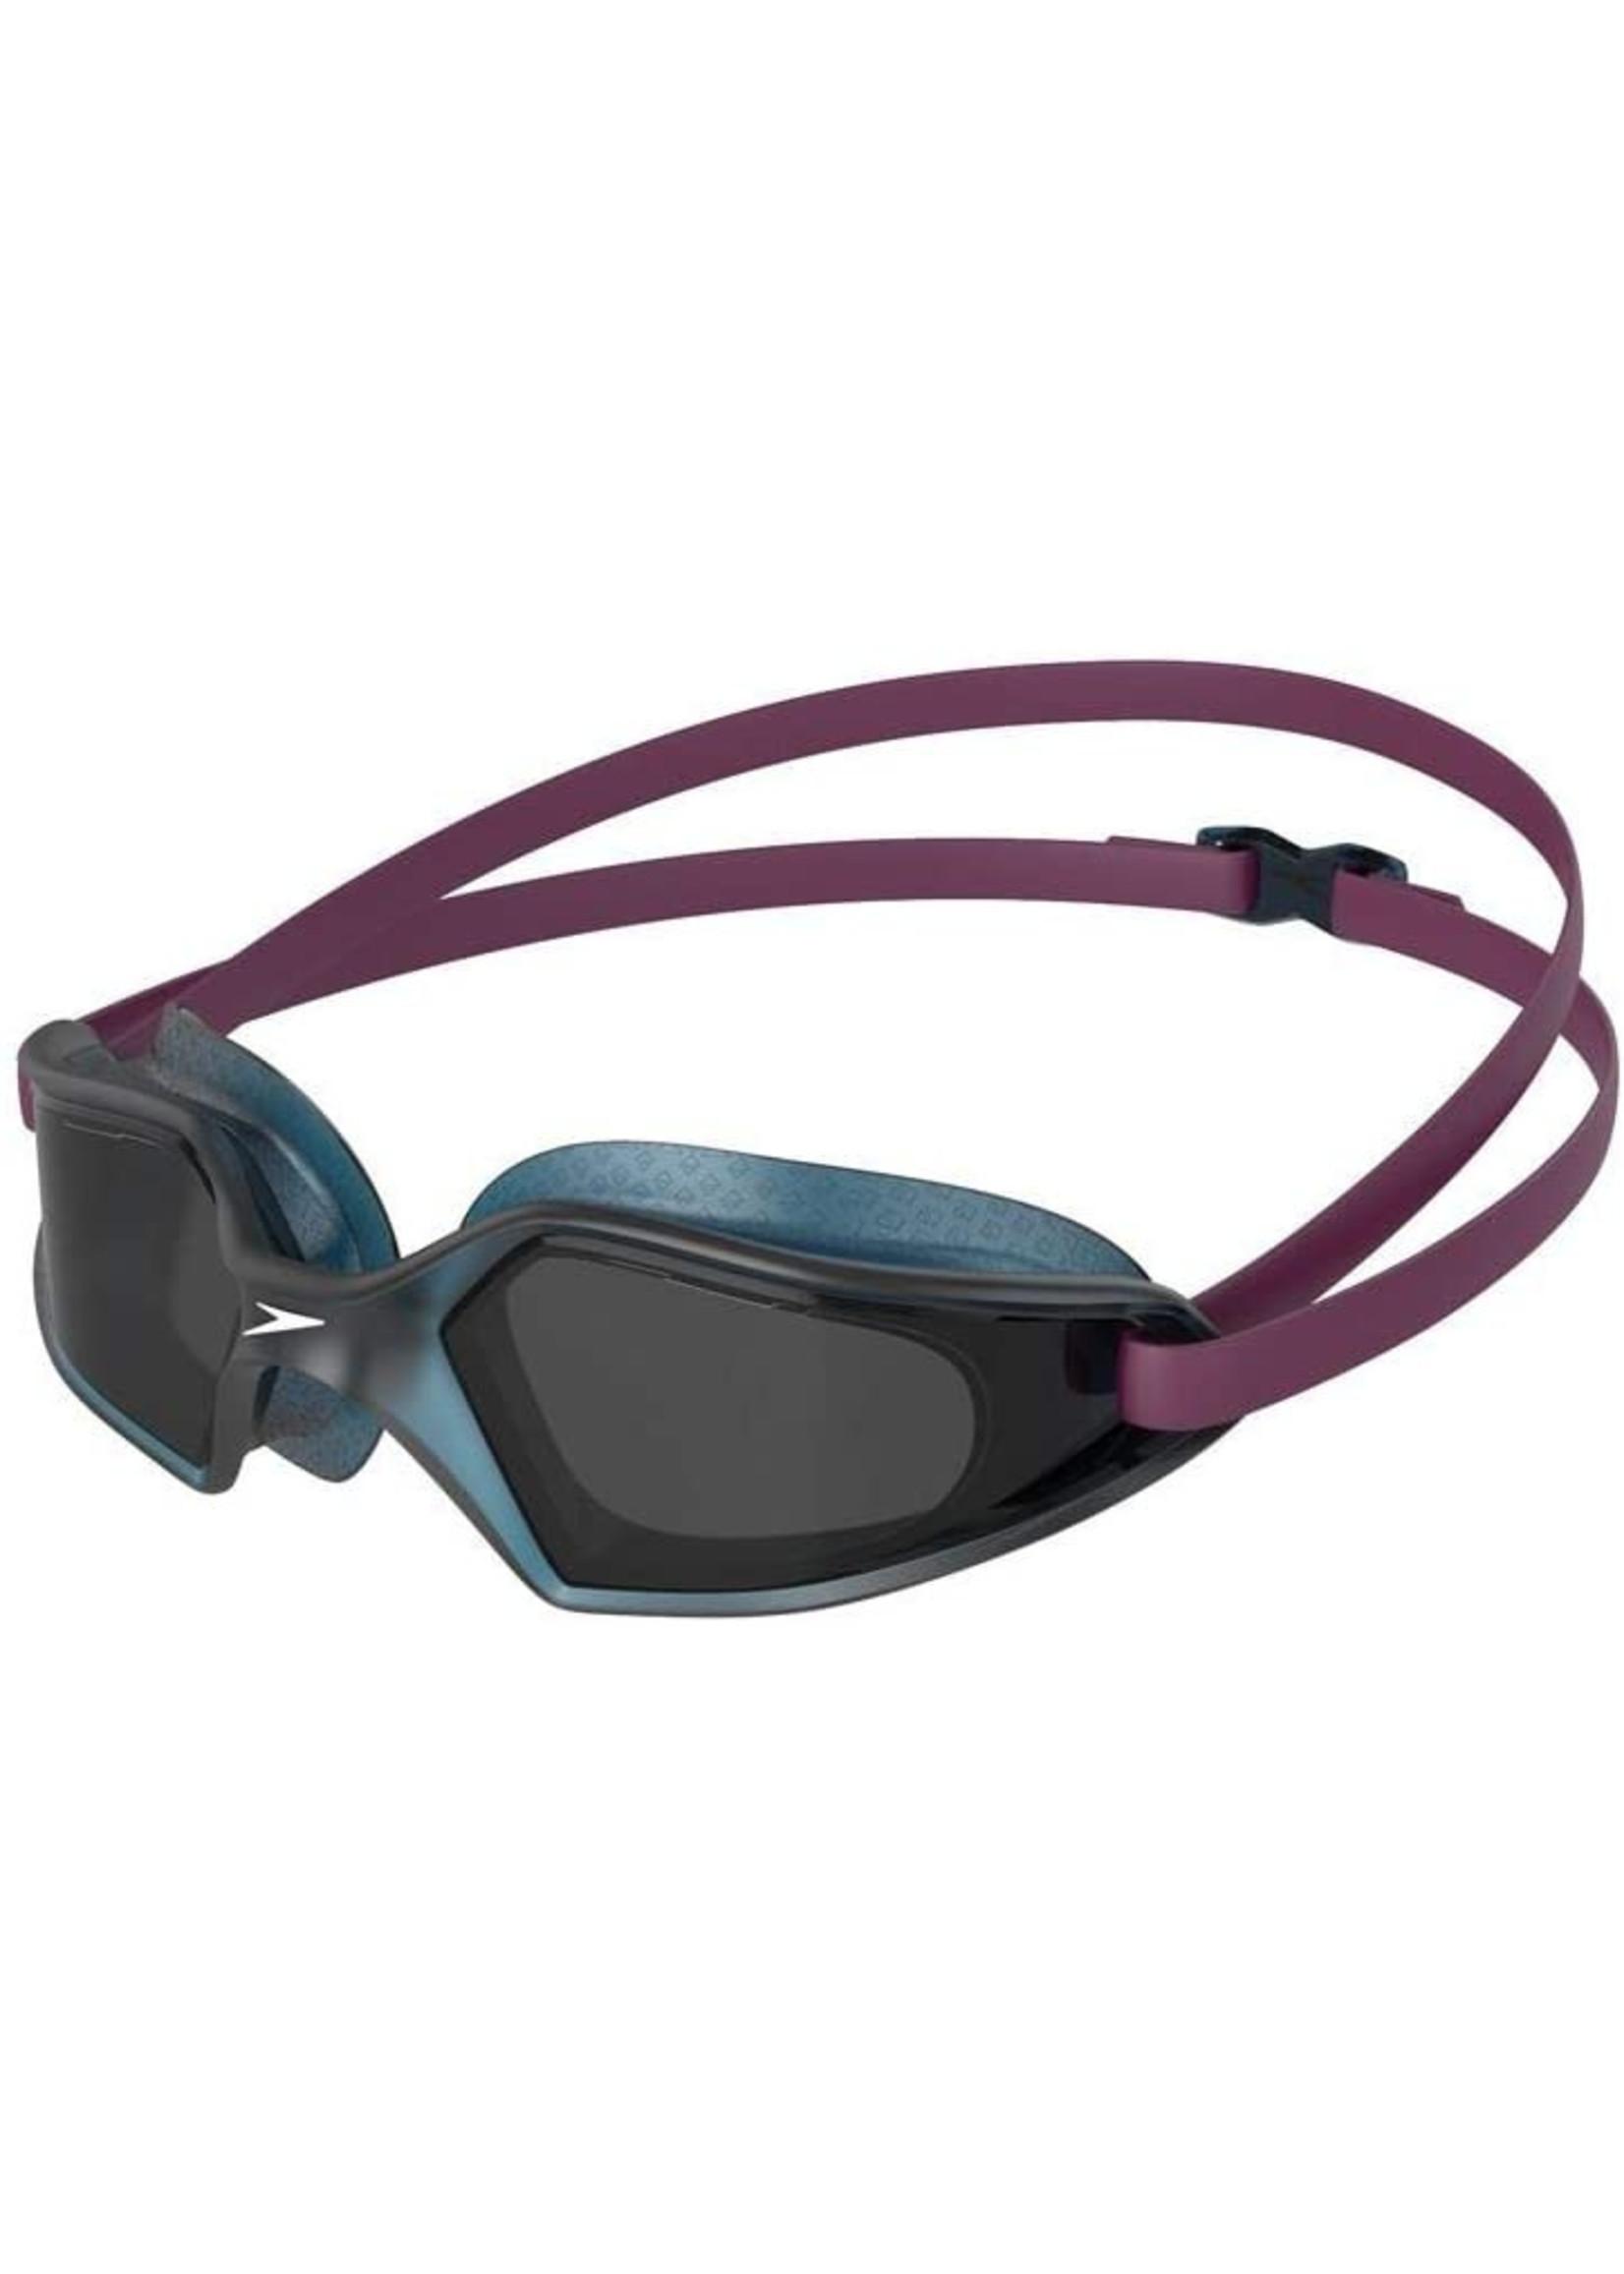 Speedo Speedo Hydropulse Adult Swimming Goggle (2021)